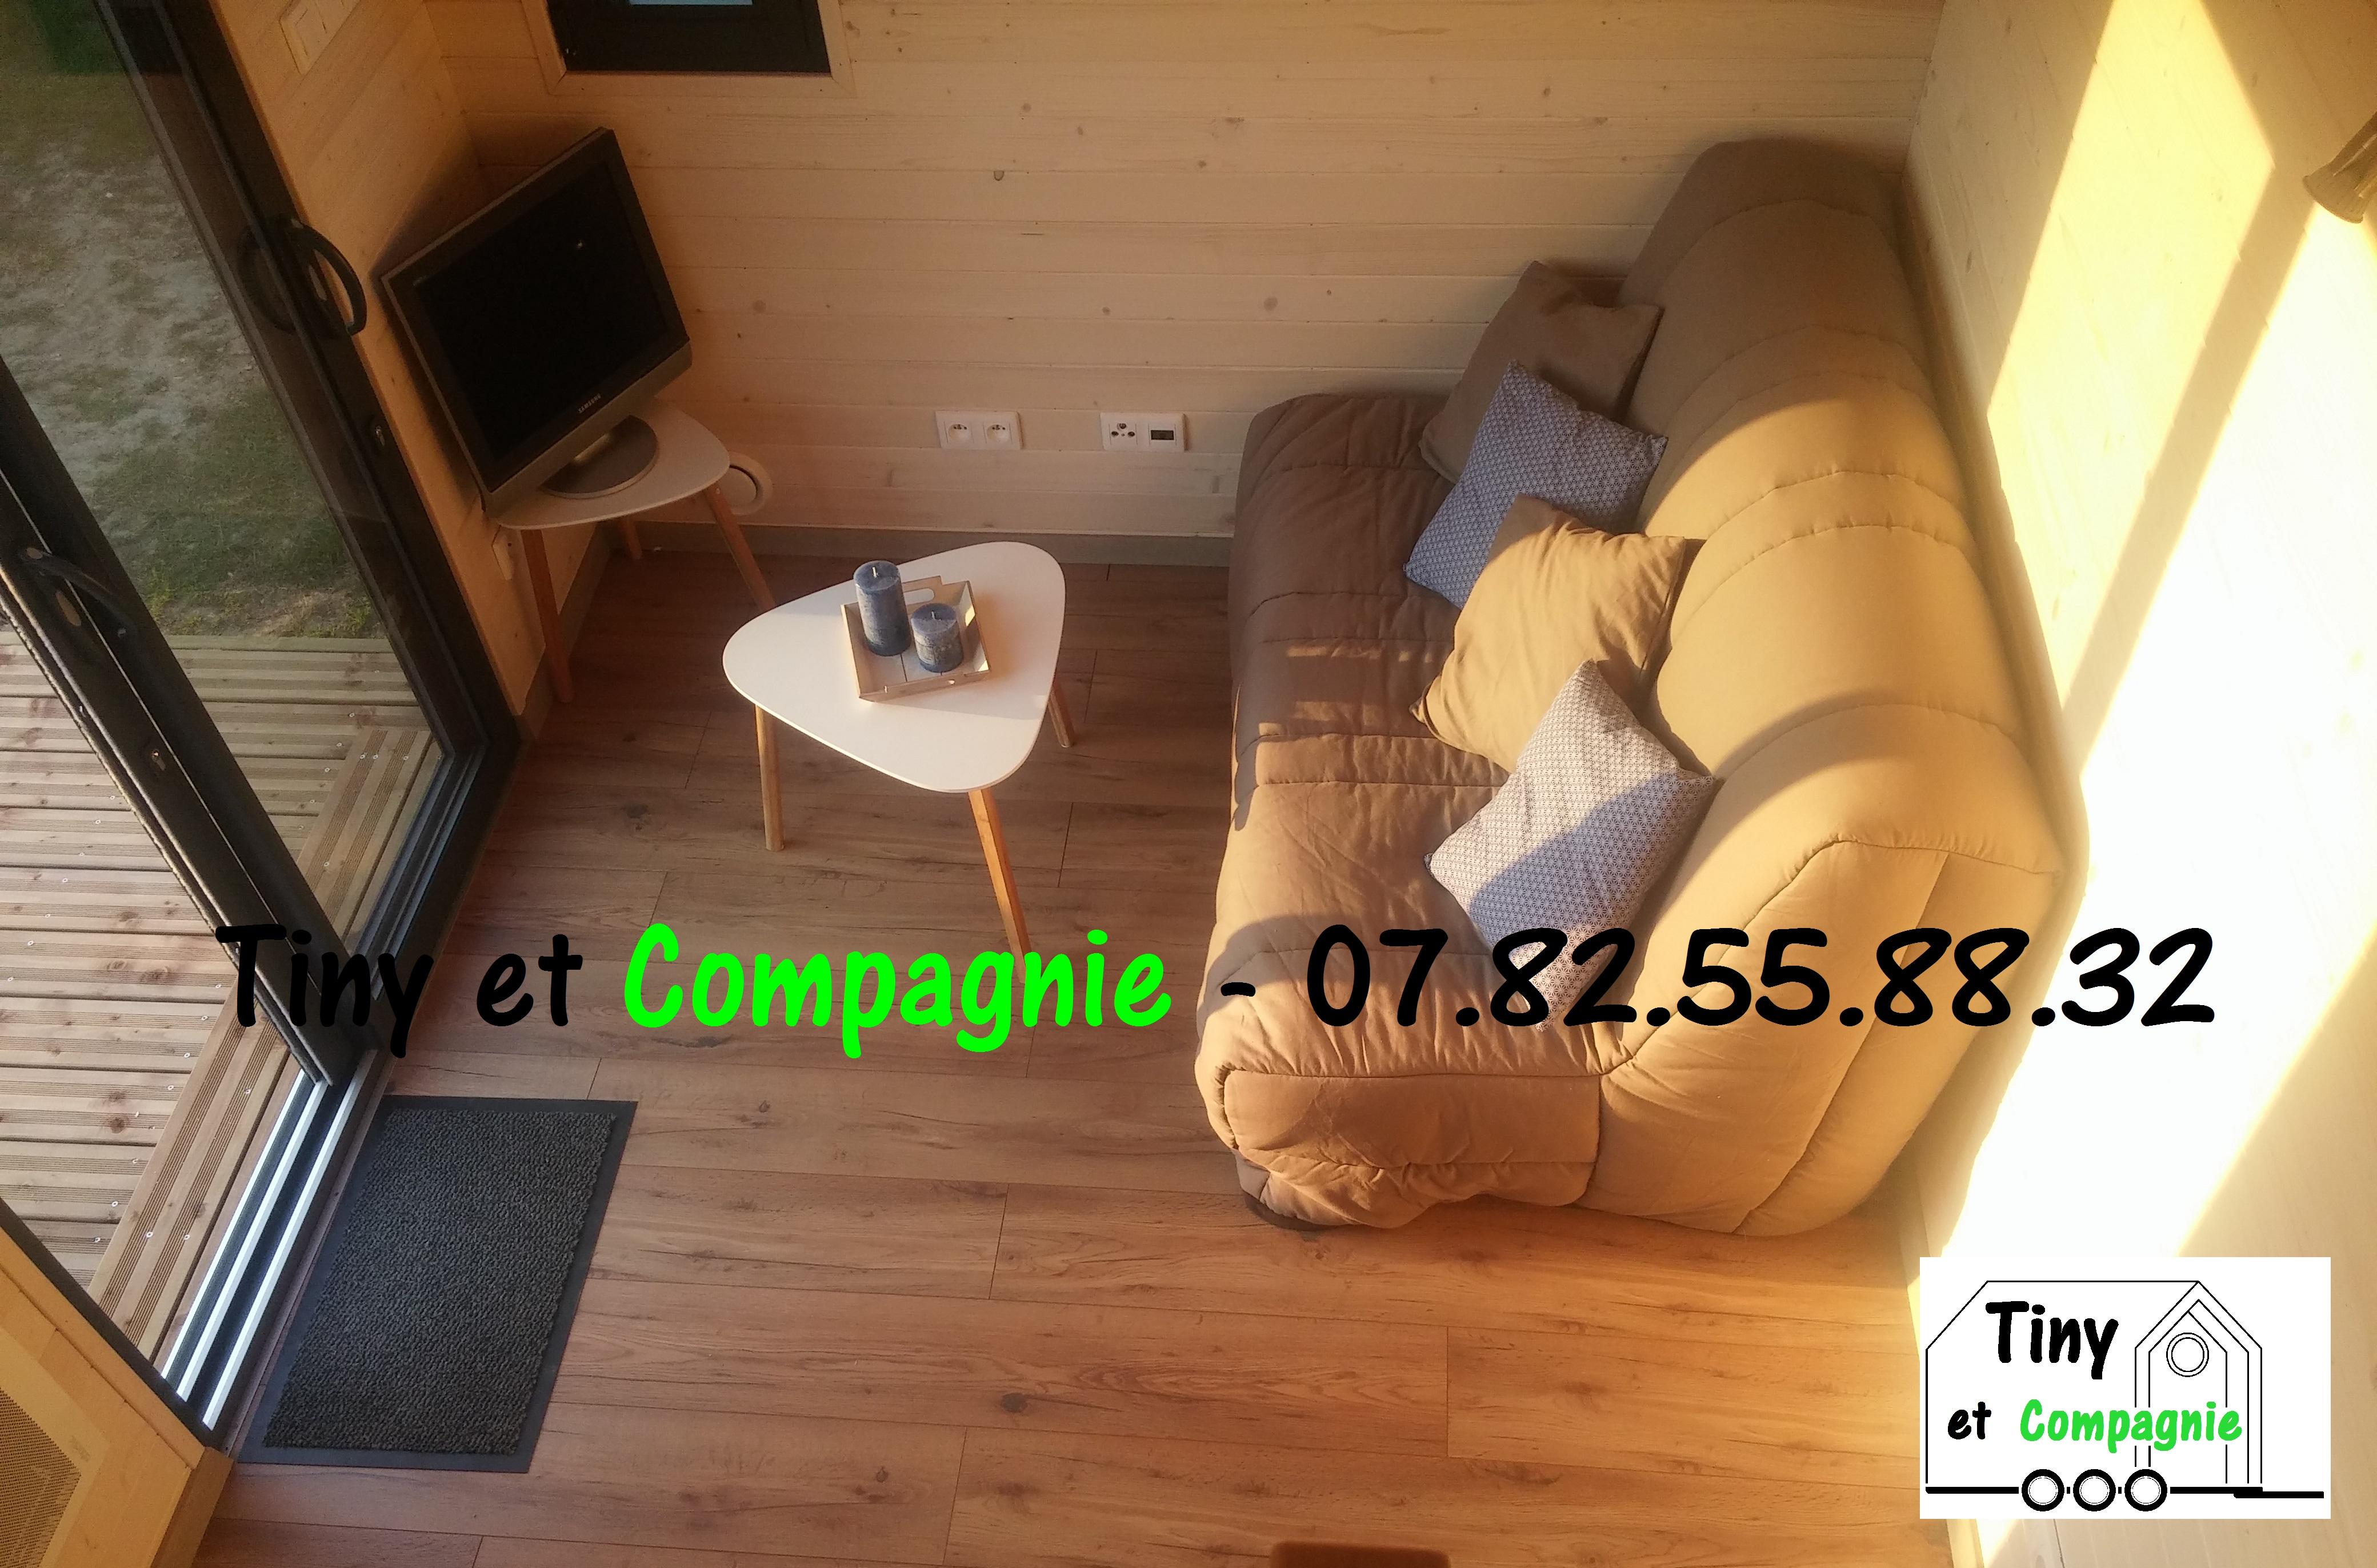 Tiny et Compagnie - Colibri 2019 (Espace